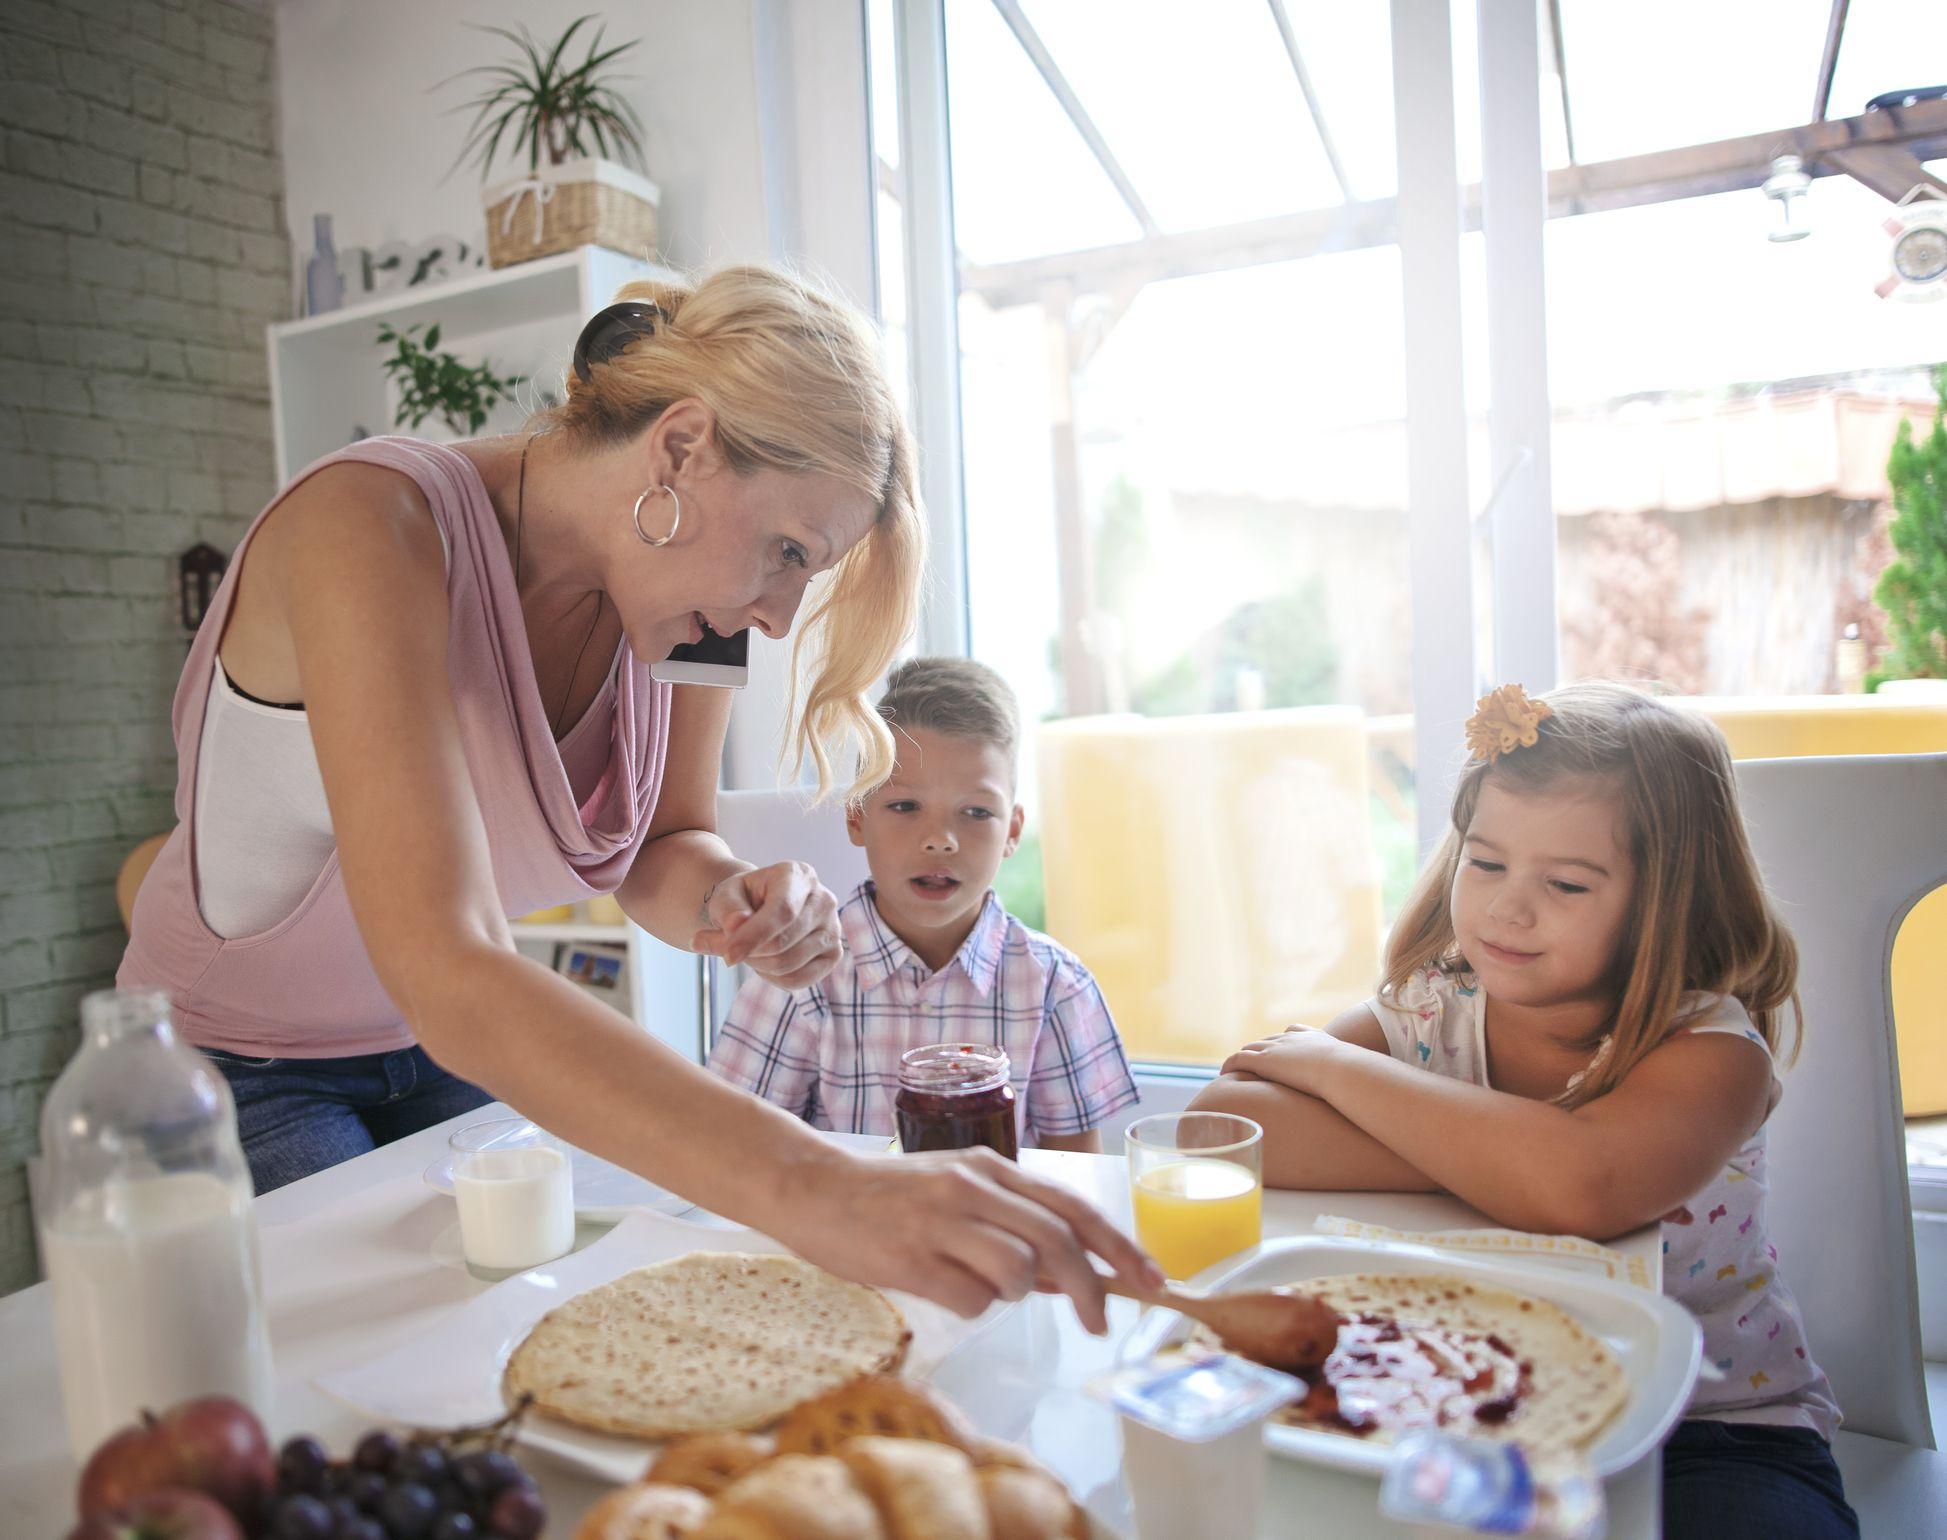 Mother serving breakfast while multitasking